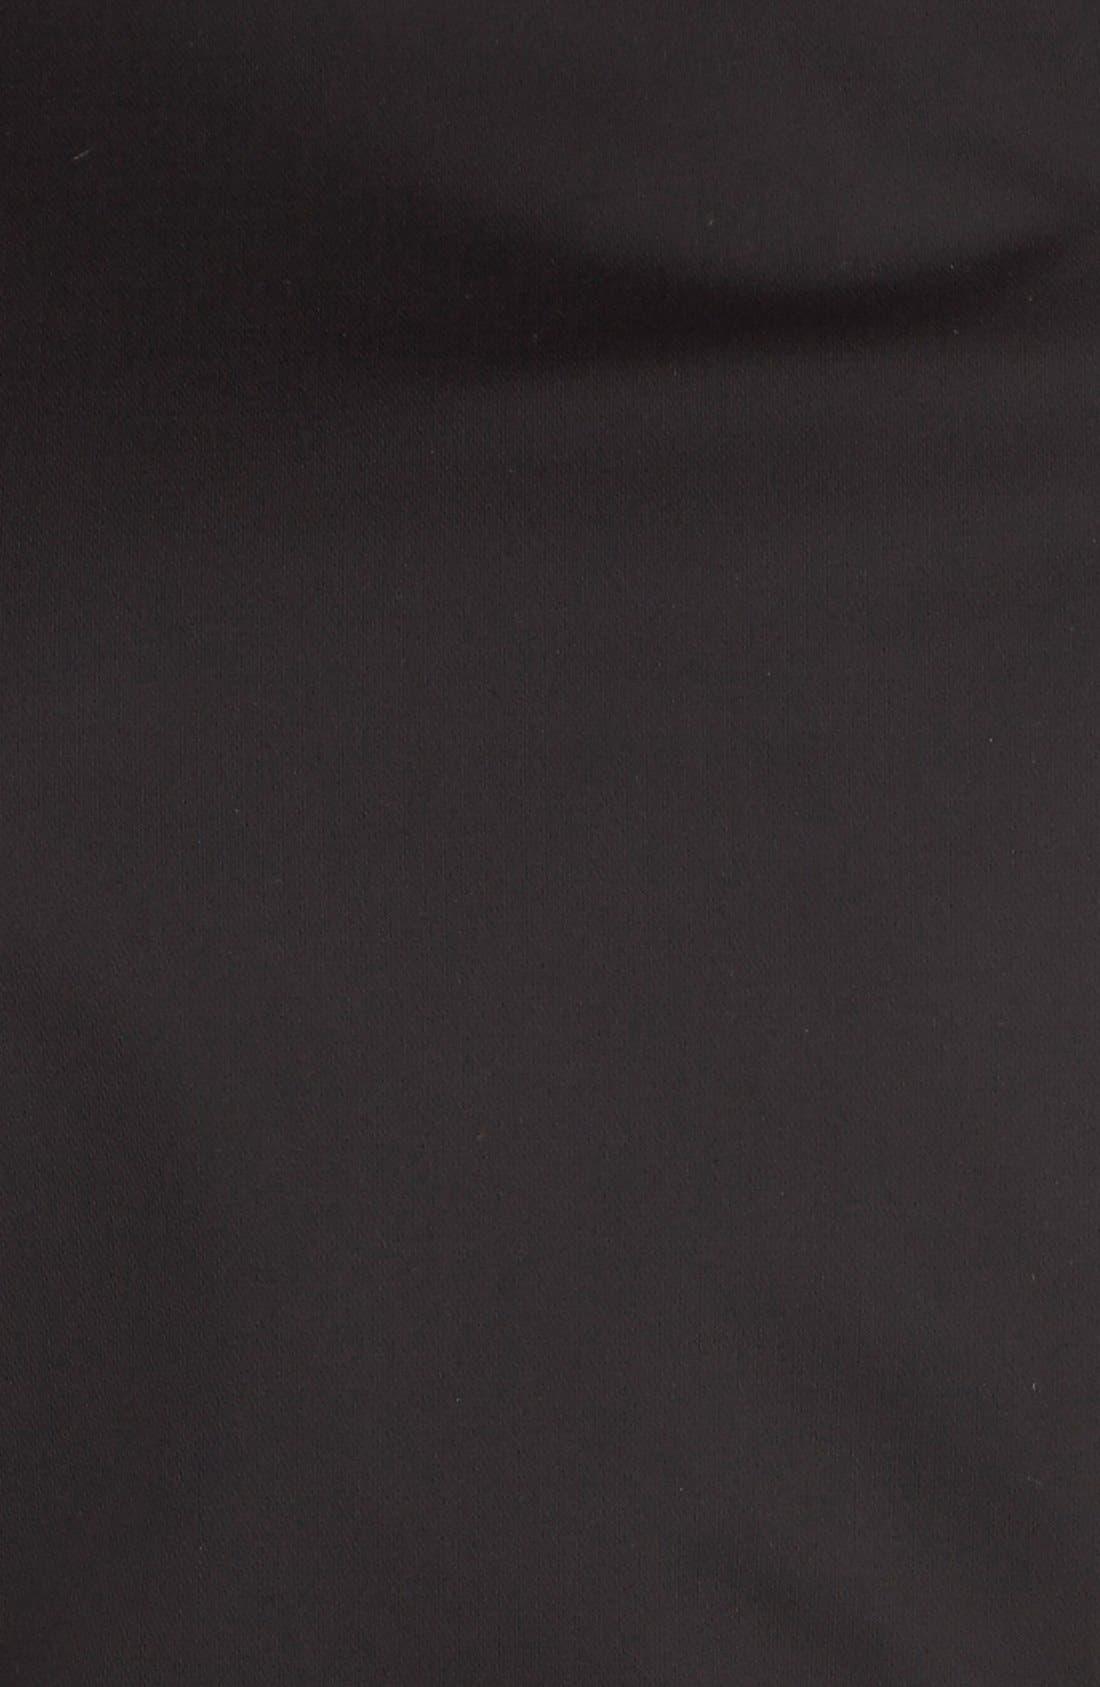 Short Zip Trench Coat,                             Alternate thumbnail 5, color,                             Black